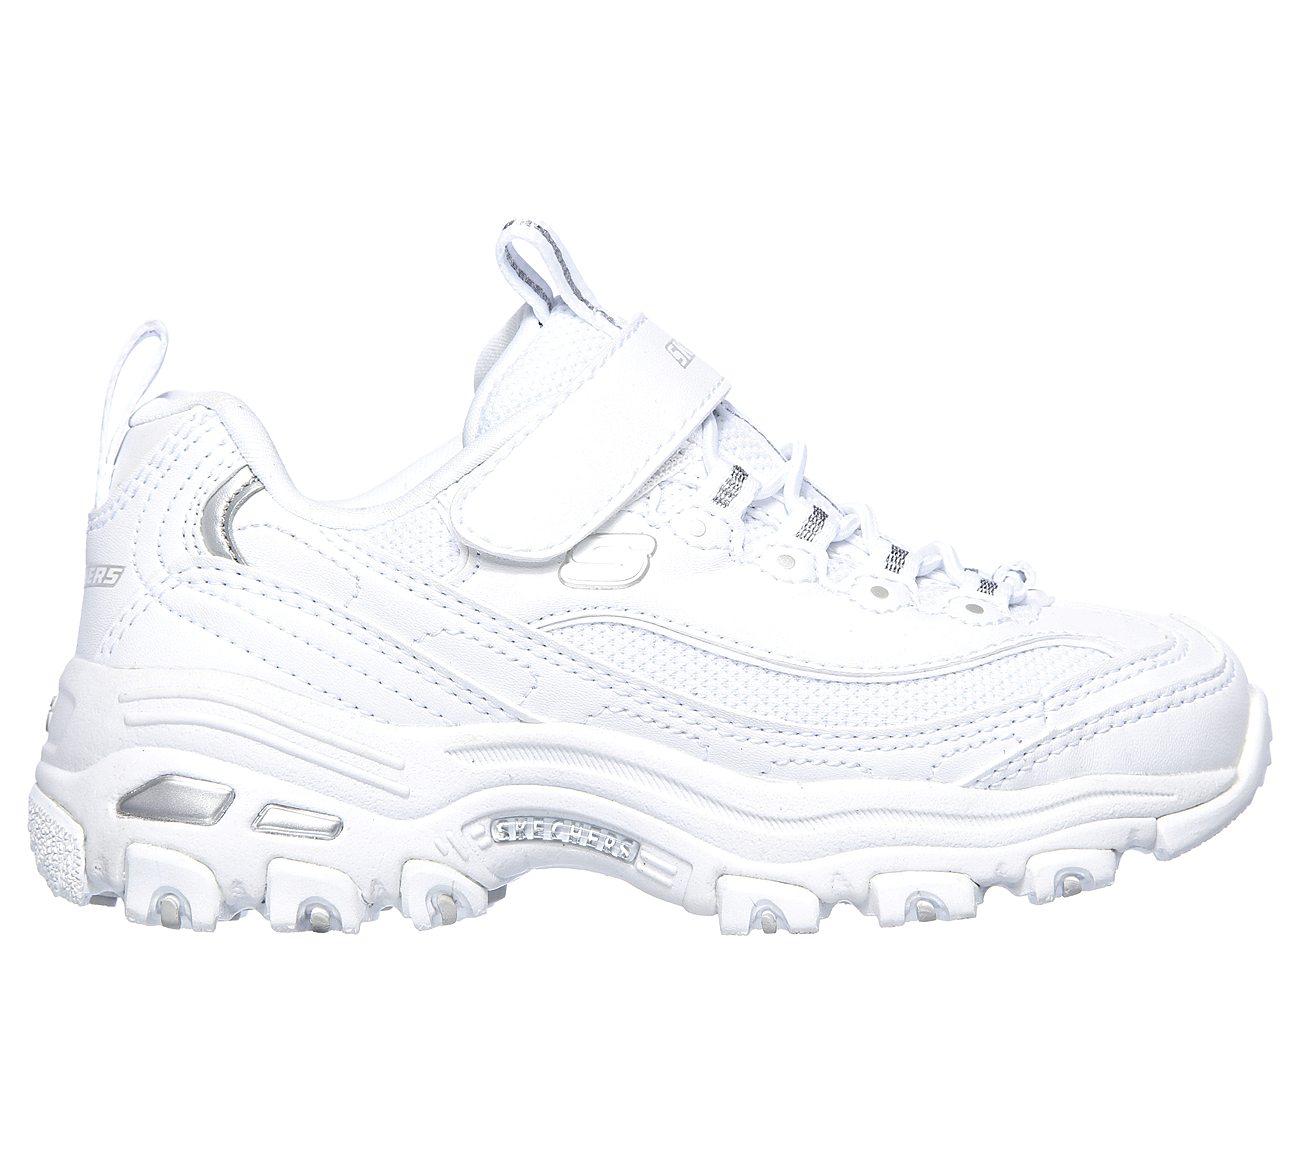 Buy SKECHERS D'Lites In The Clear D'Lites Shoes 7KZ01